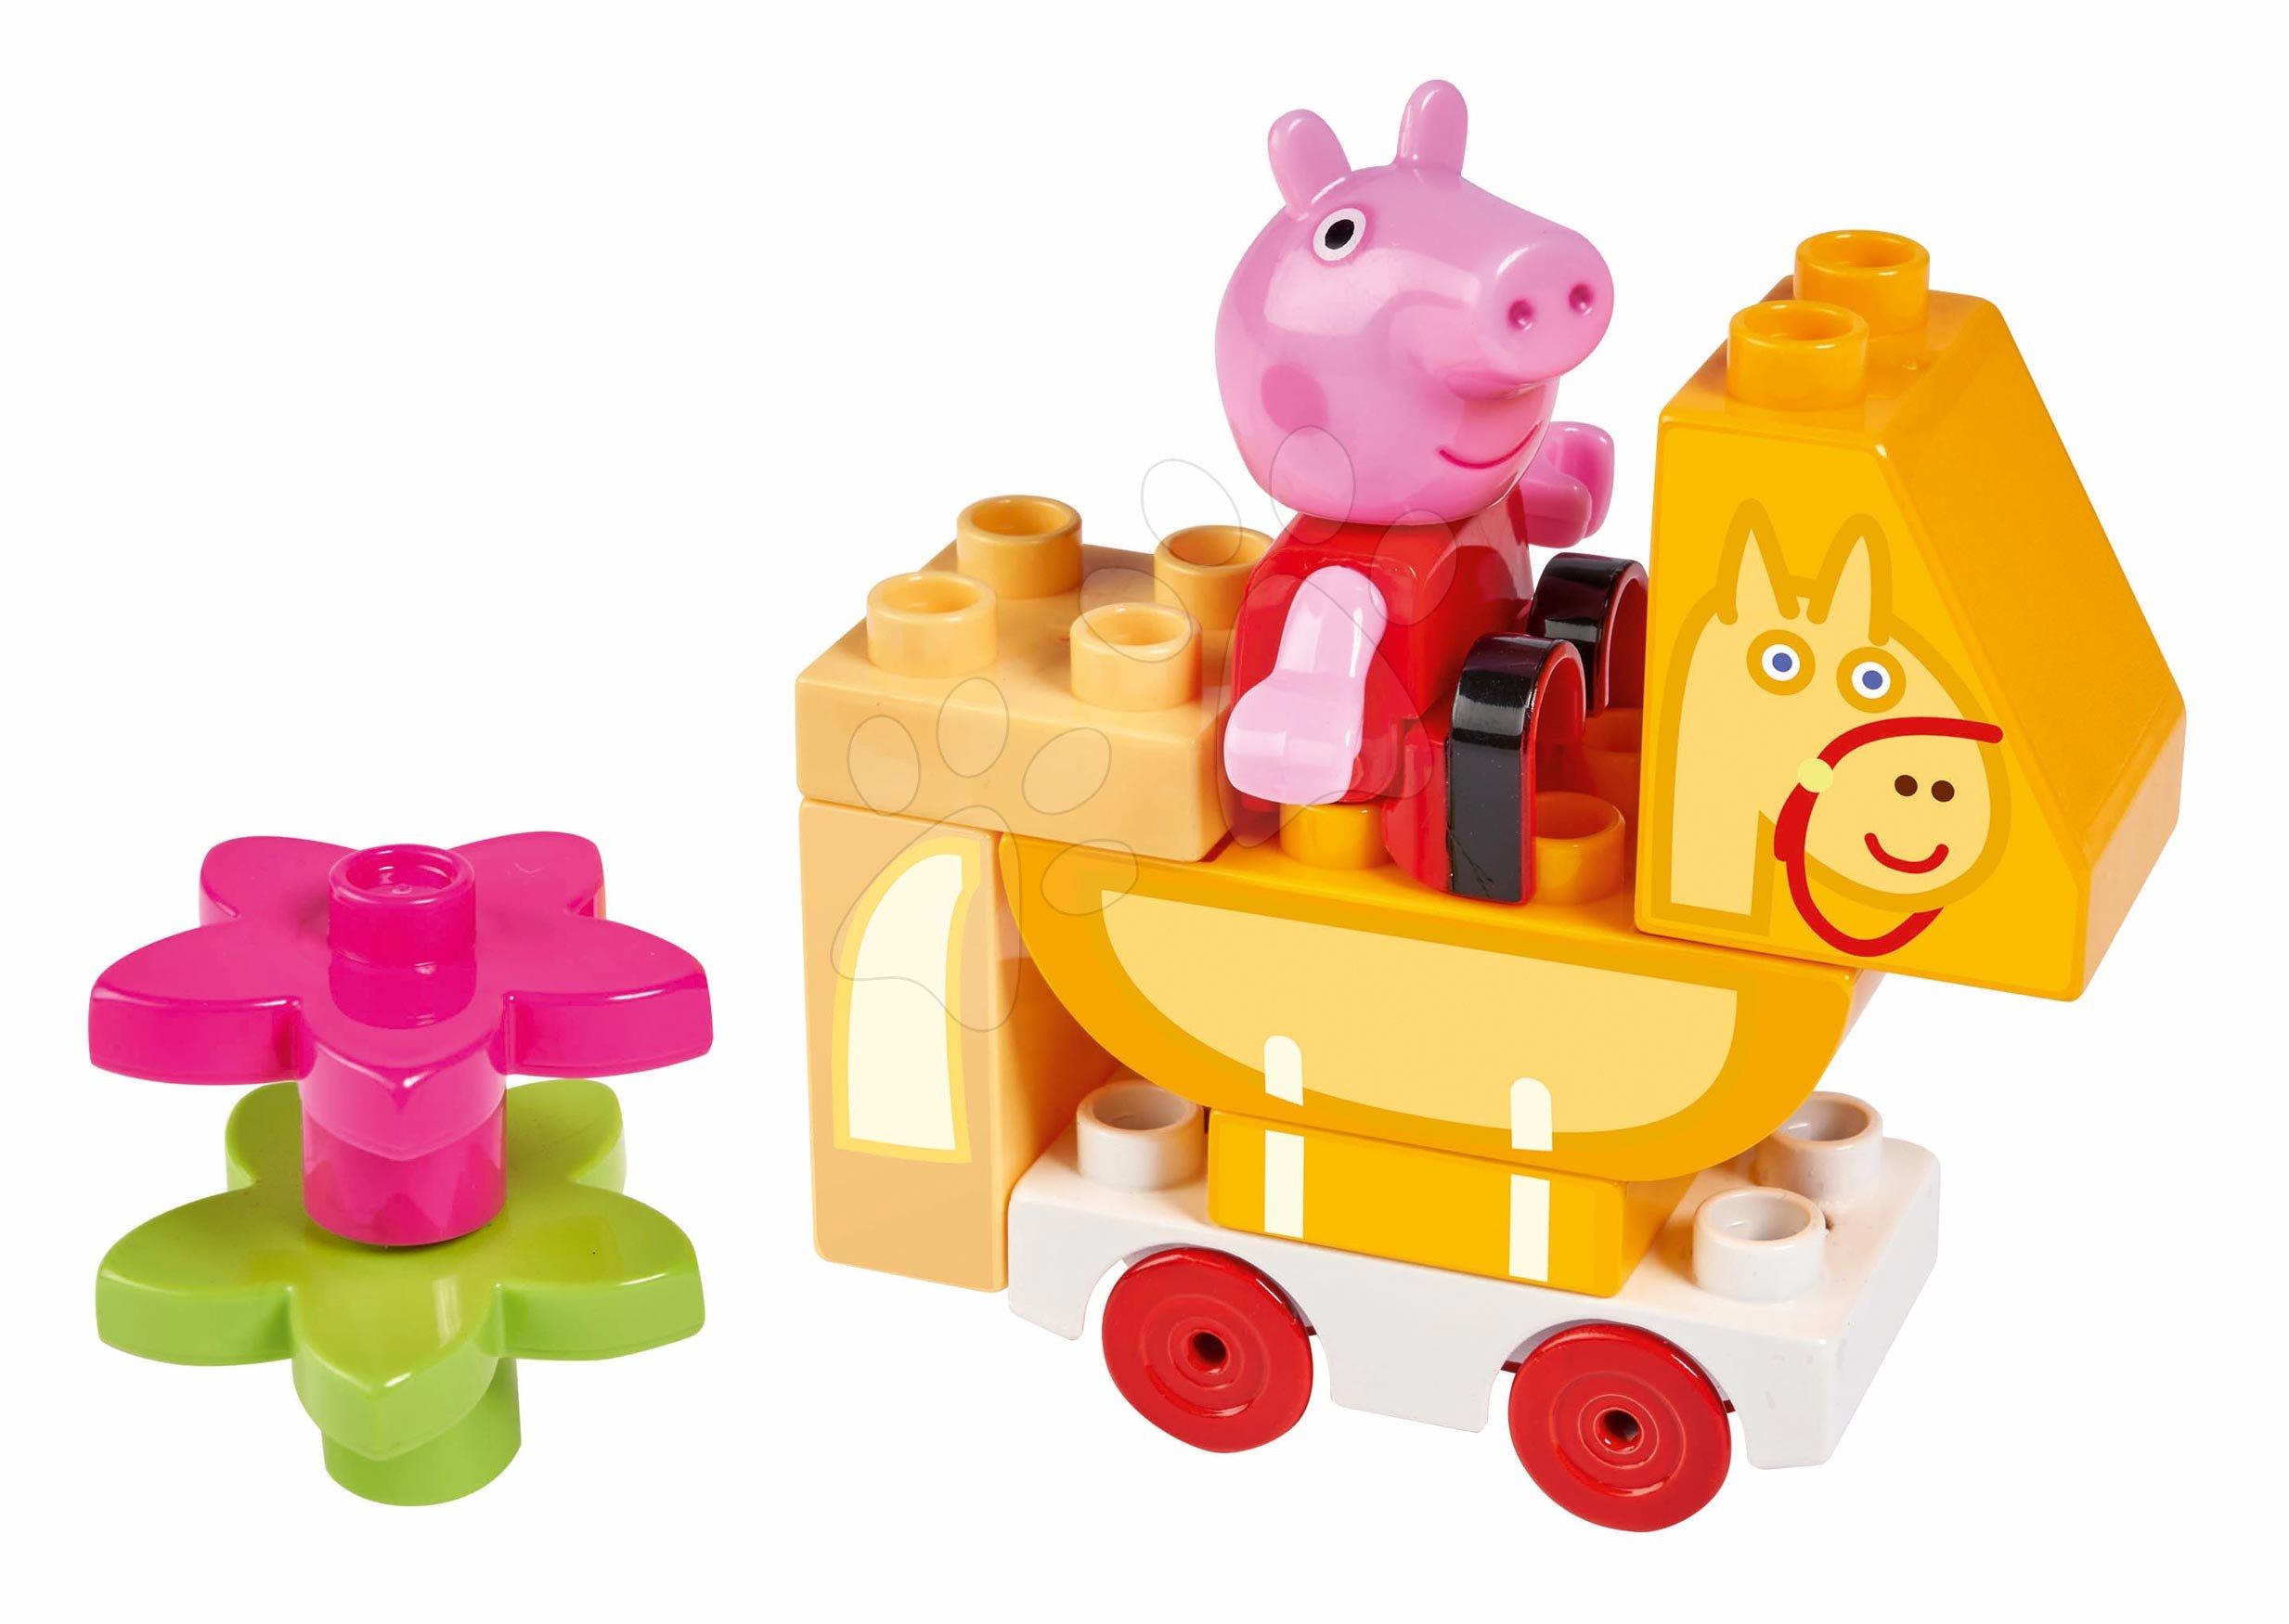 Stavebnica Peppa Pig Starter Sets PlayBIG Bloxx s figúrkou na koni od 18 mes